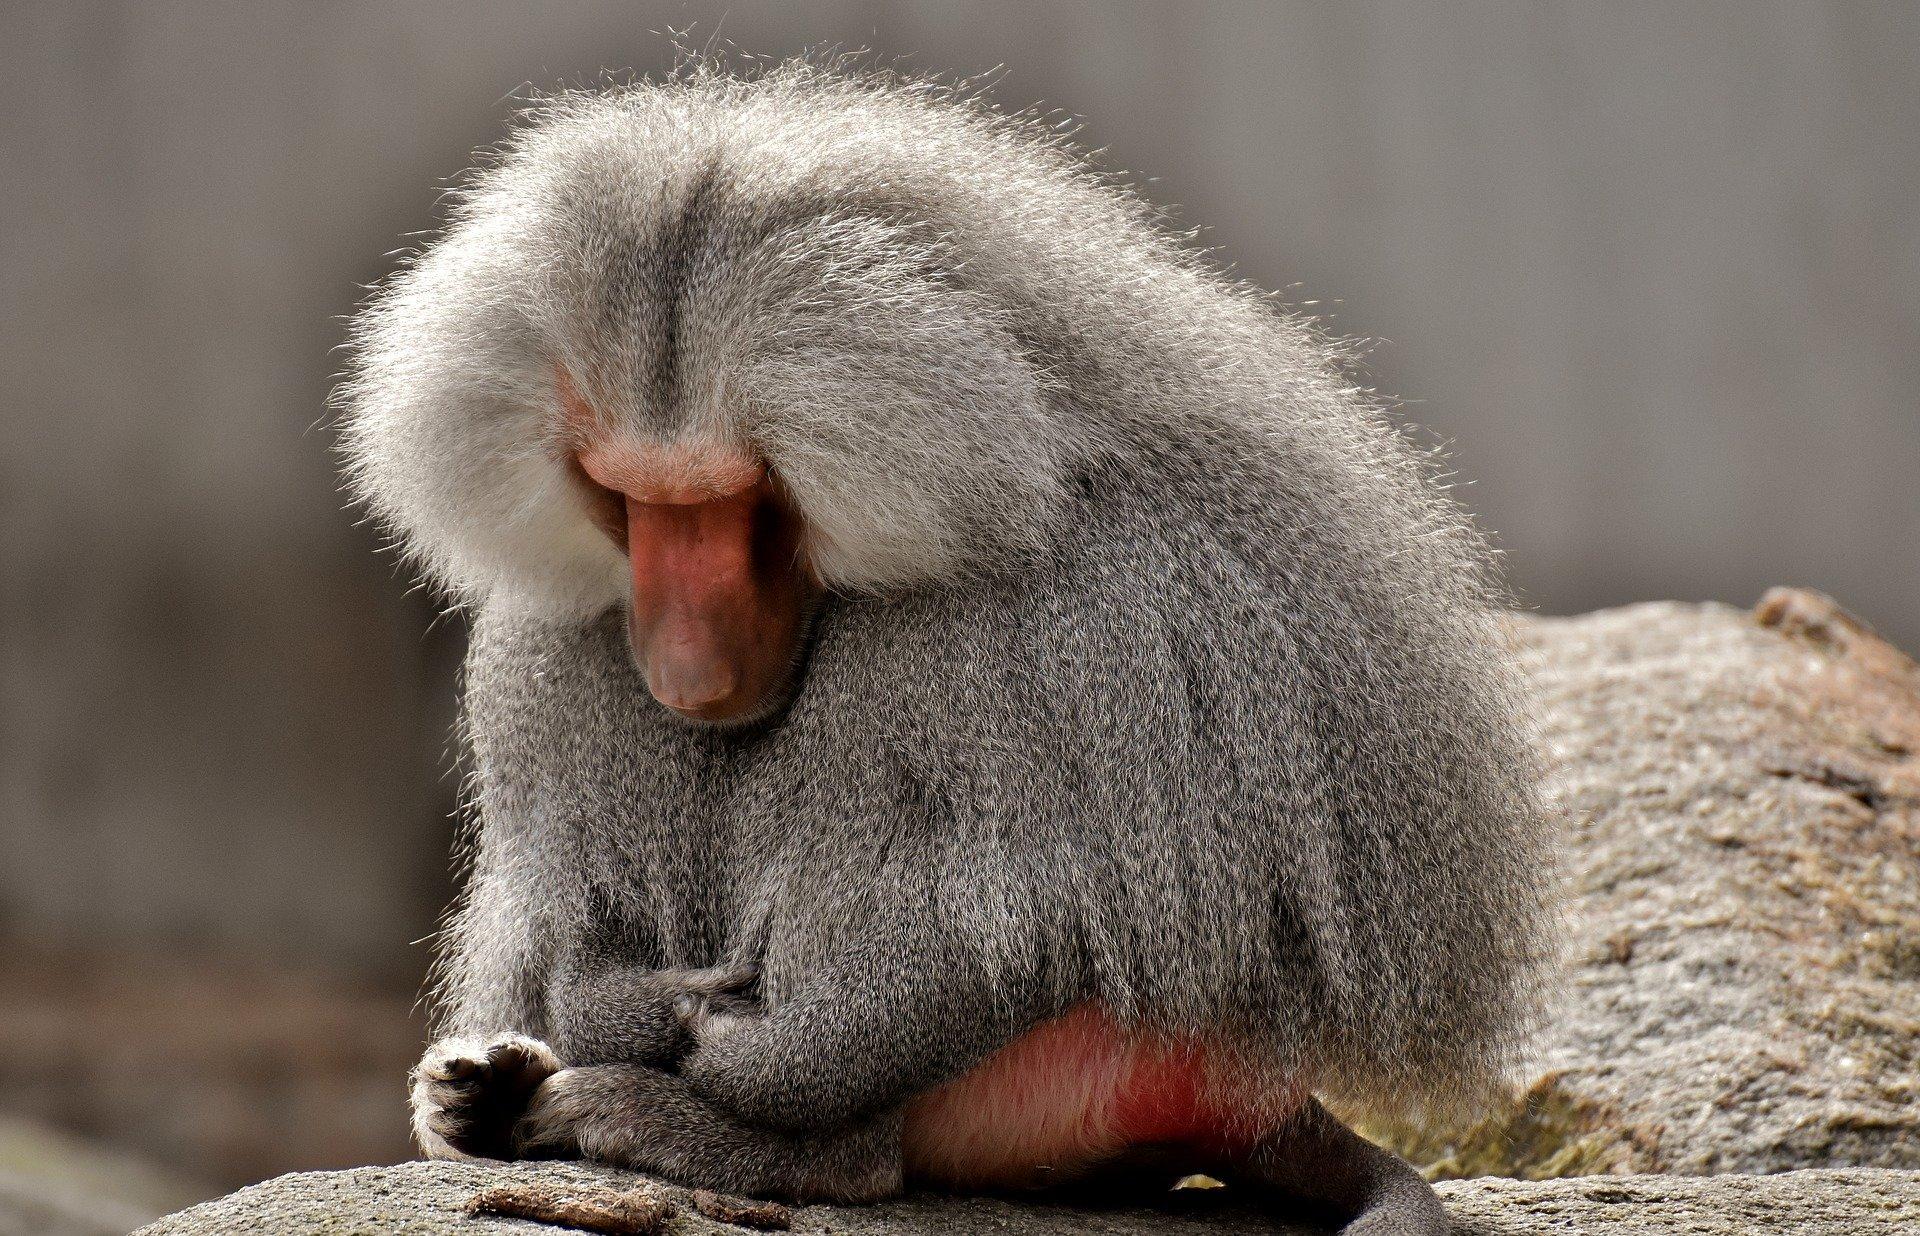 Fortschritte in der Transplantation pig hearts into baboons